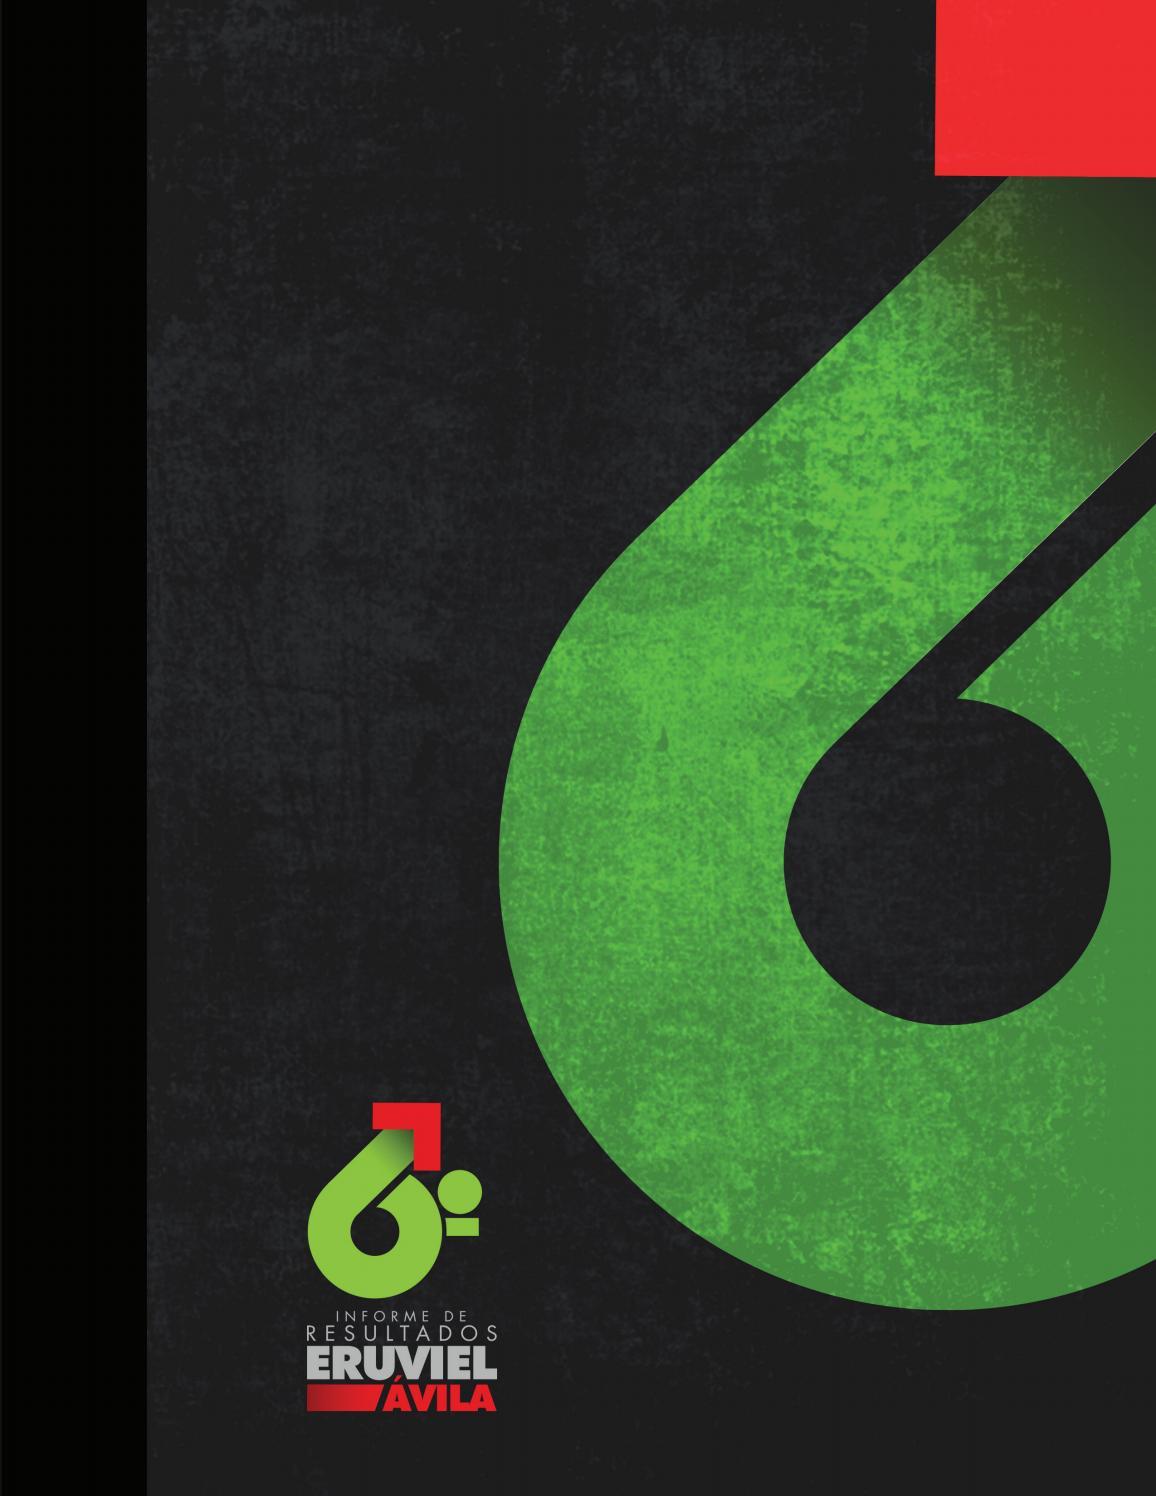 6to informe by Eruviel Ávila - issuu